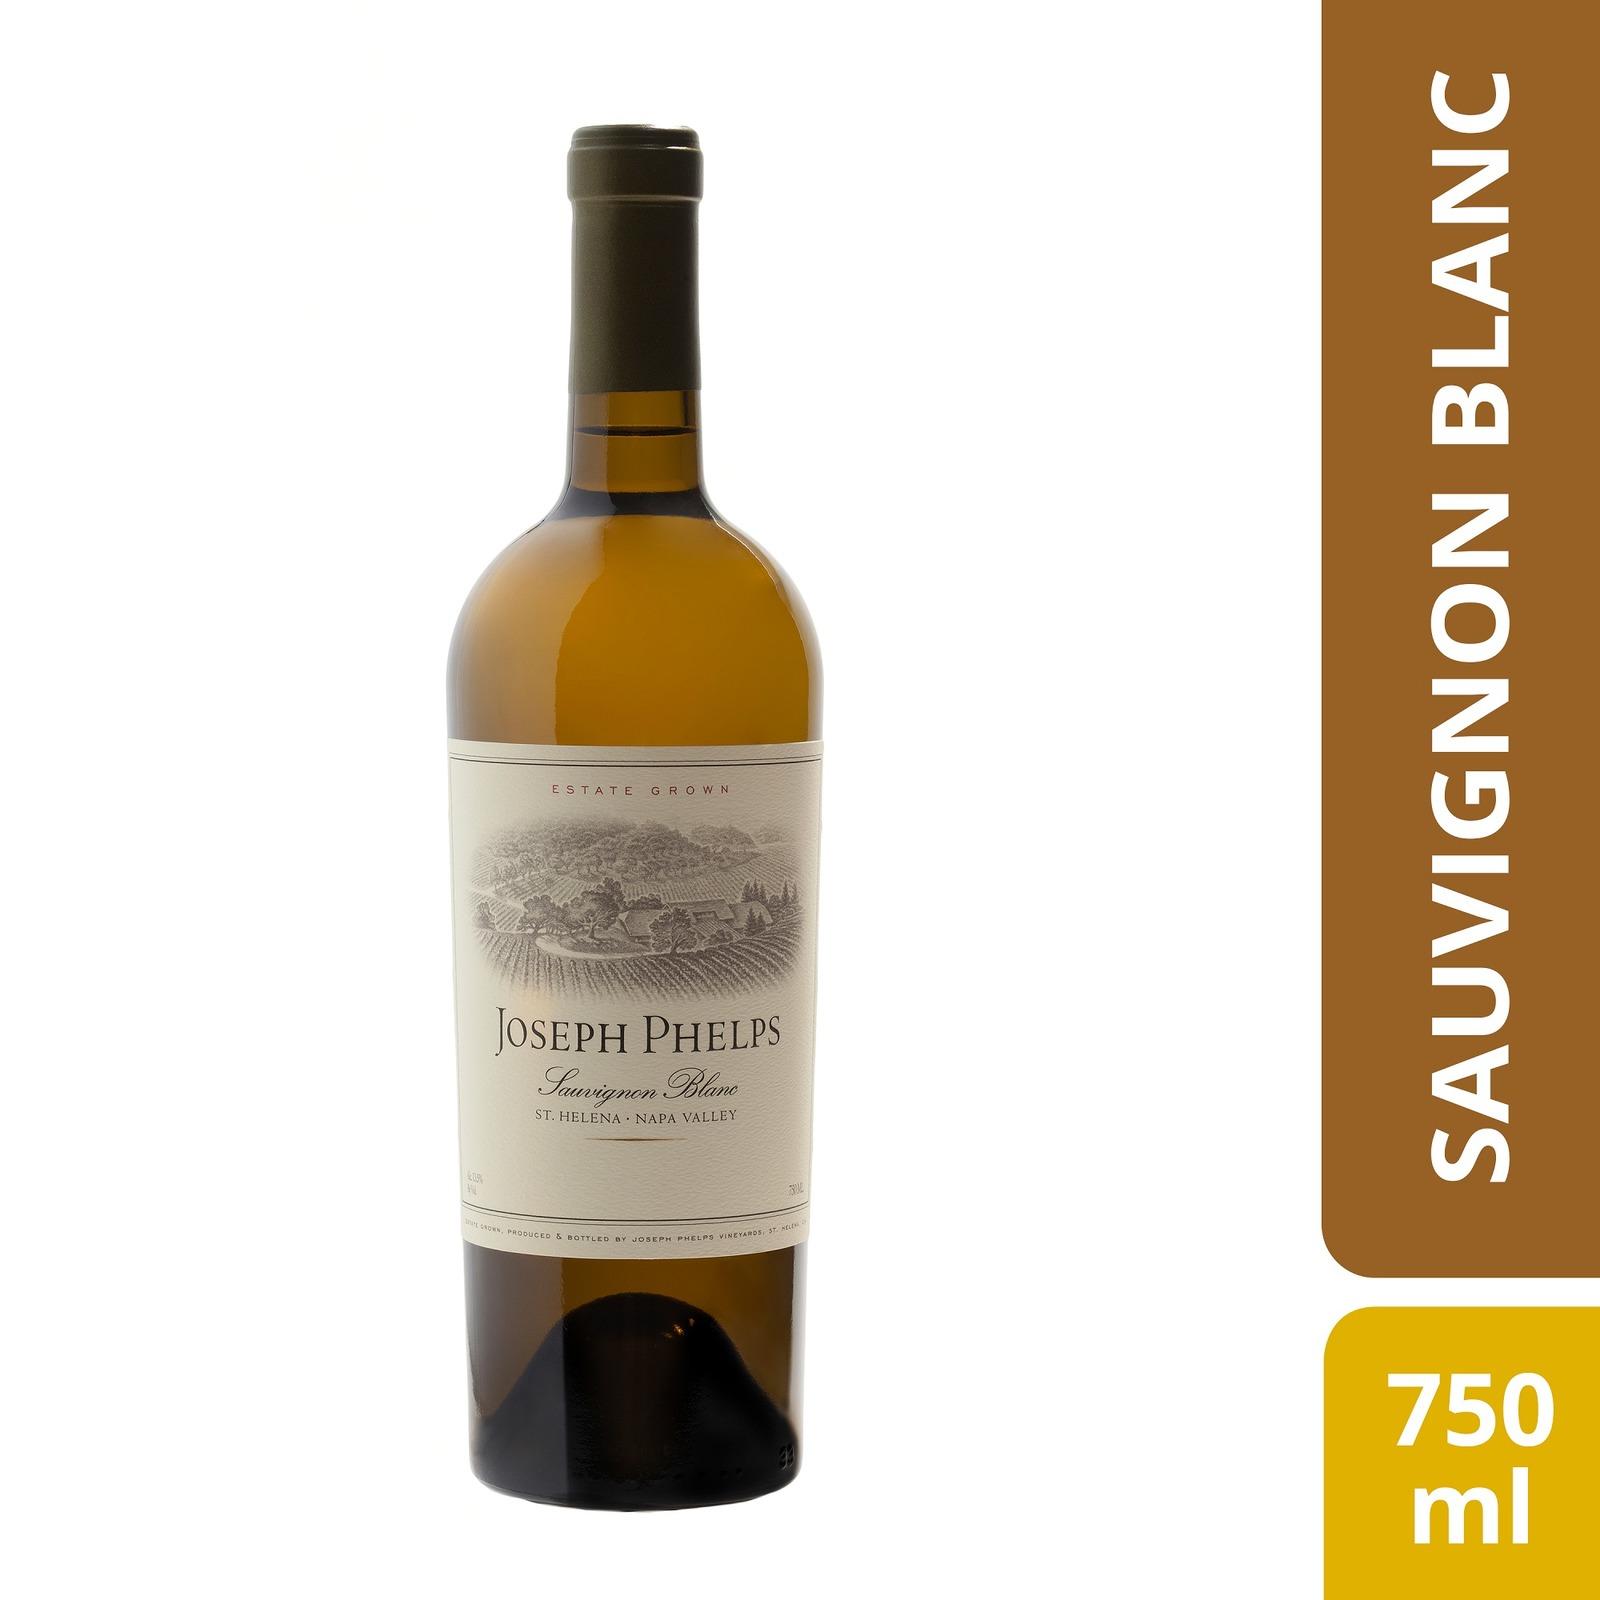 Joseph Phelps St Helena Sauvignon Blanc-By Culina